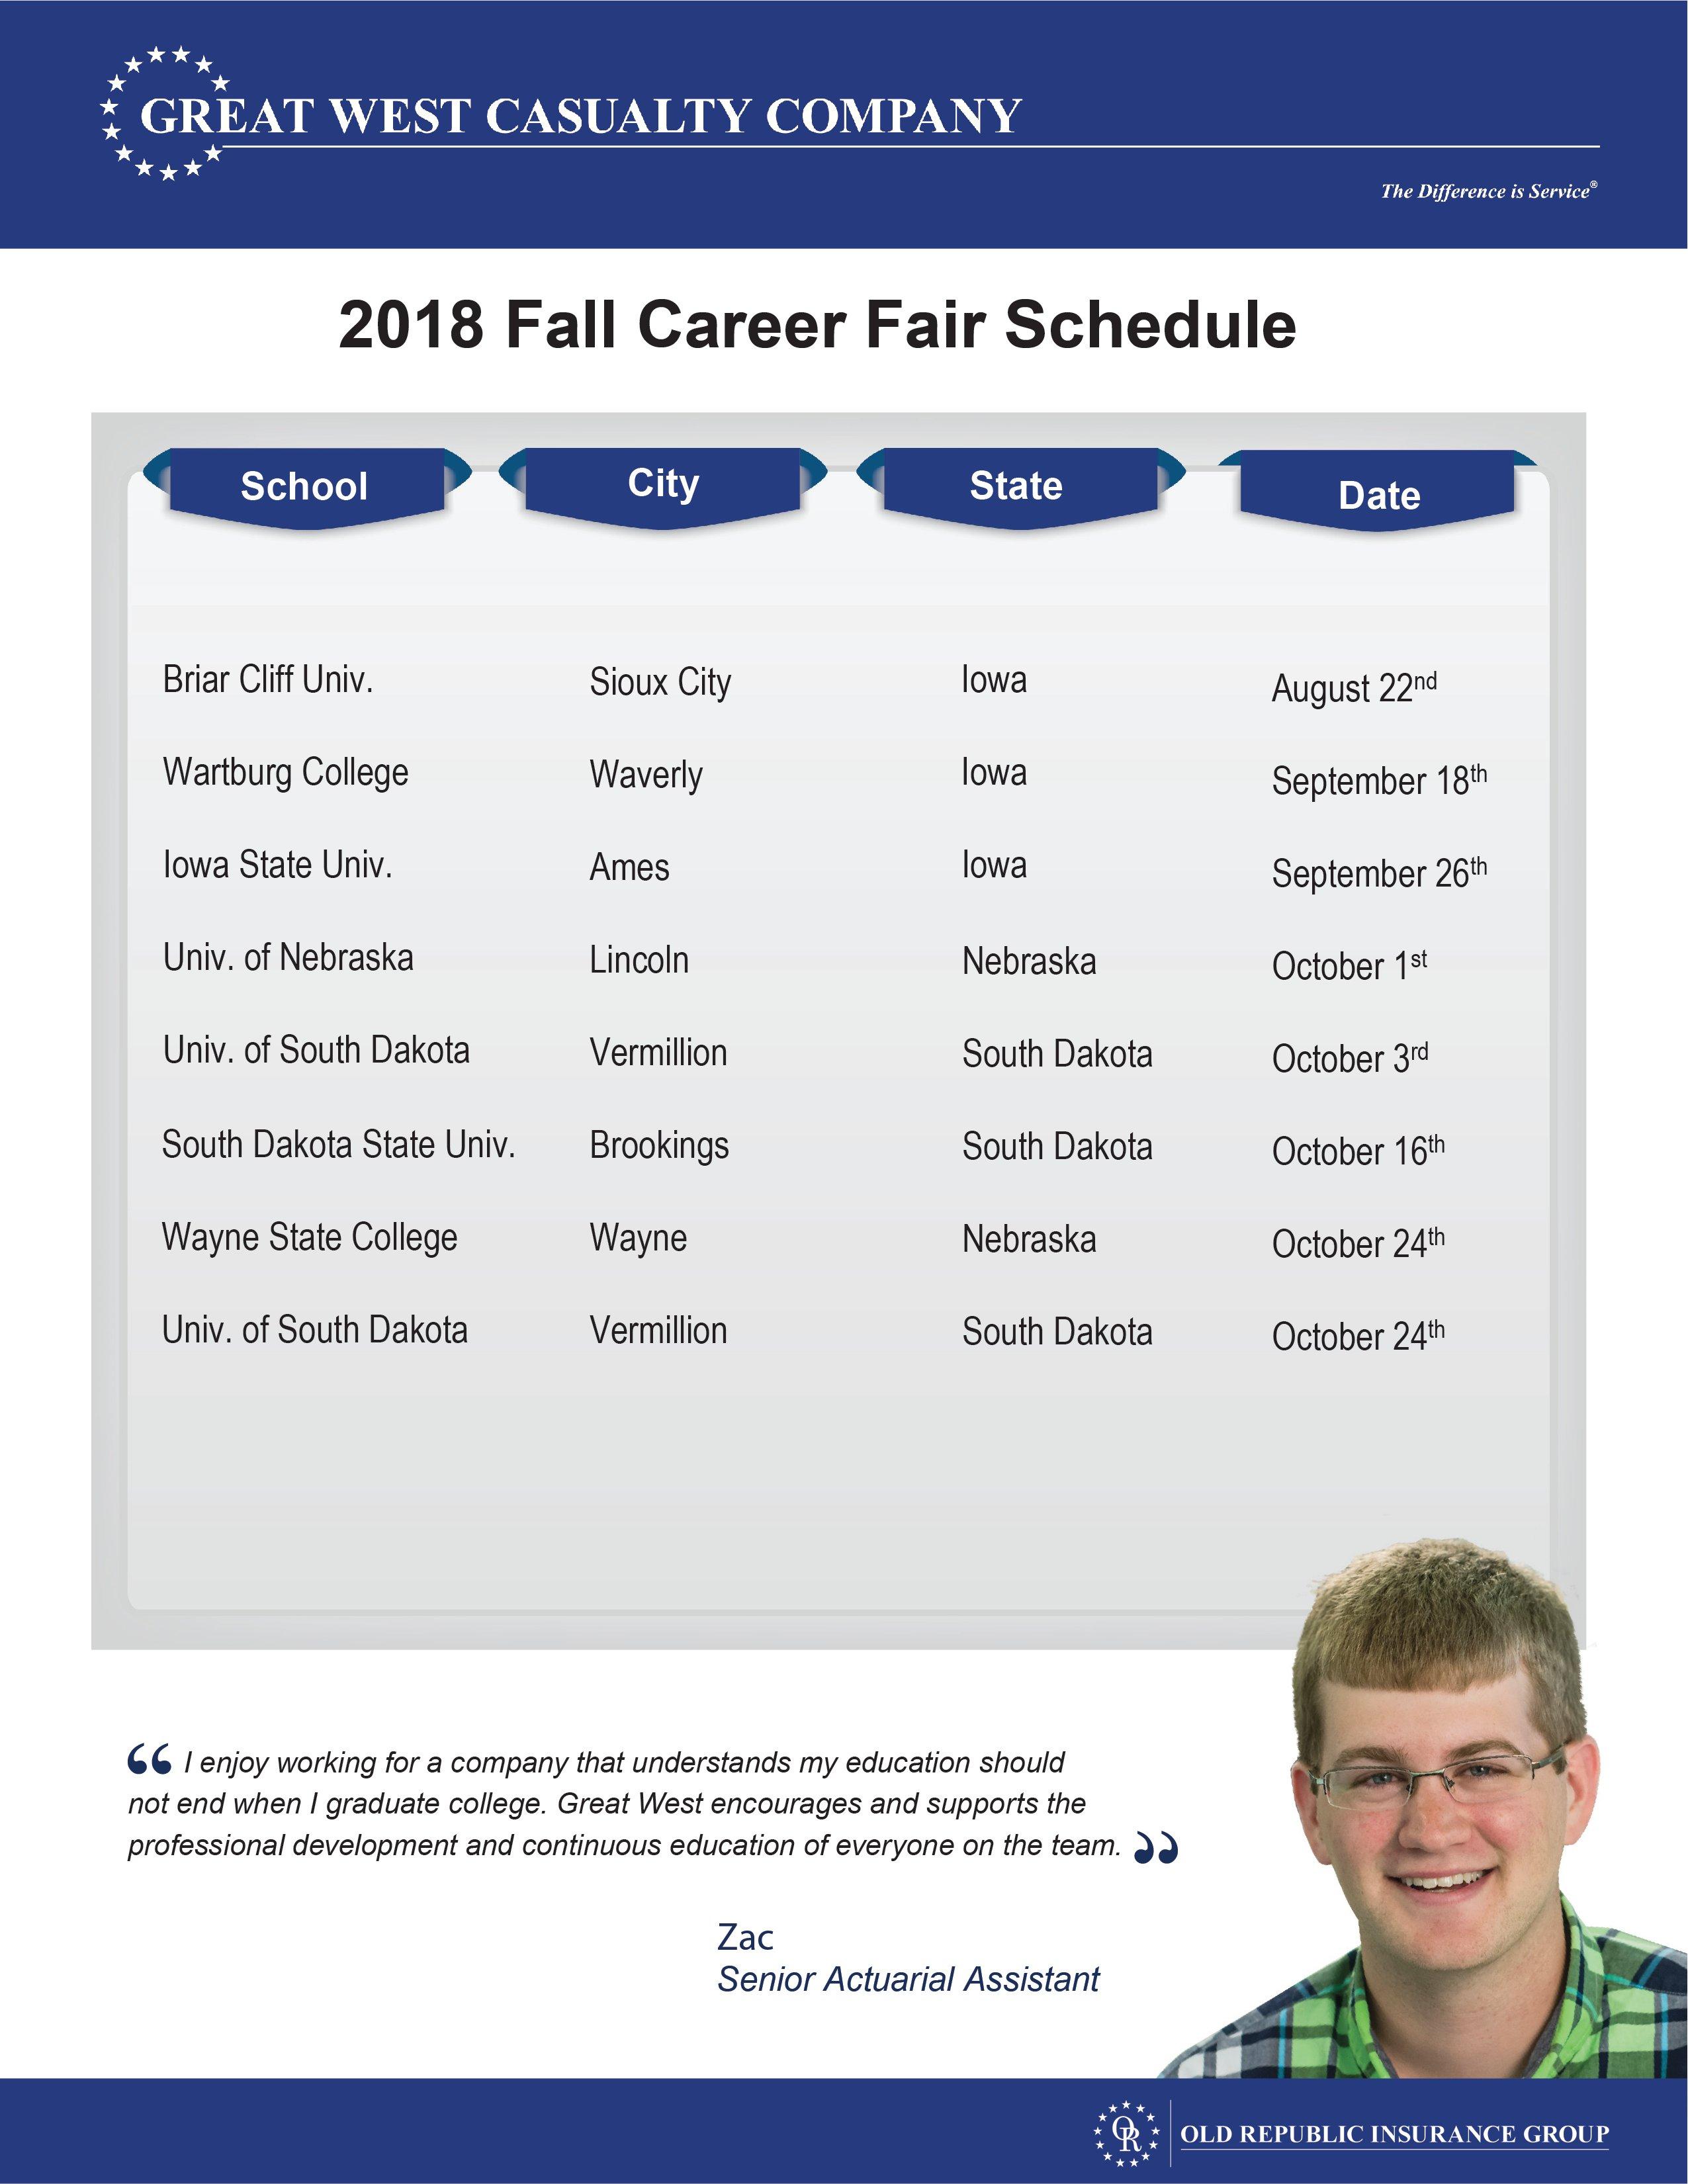 Great West Casualty Company HR Career Fair 2018 Schedule.jpg